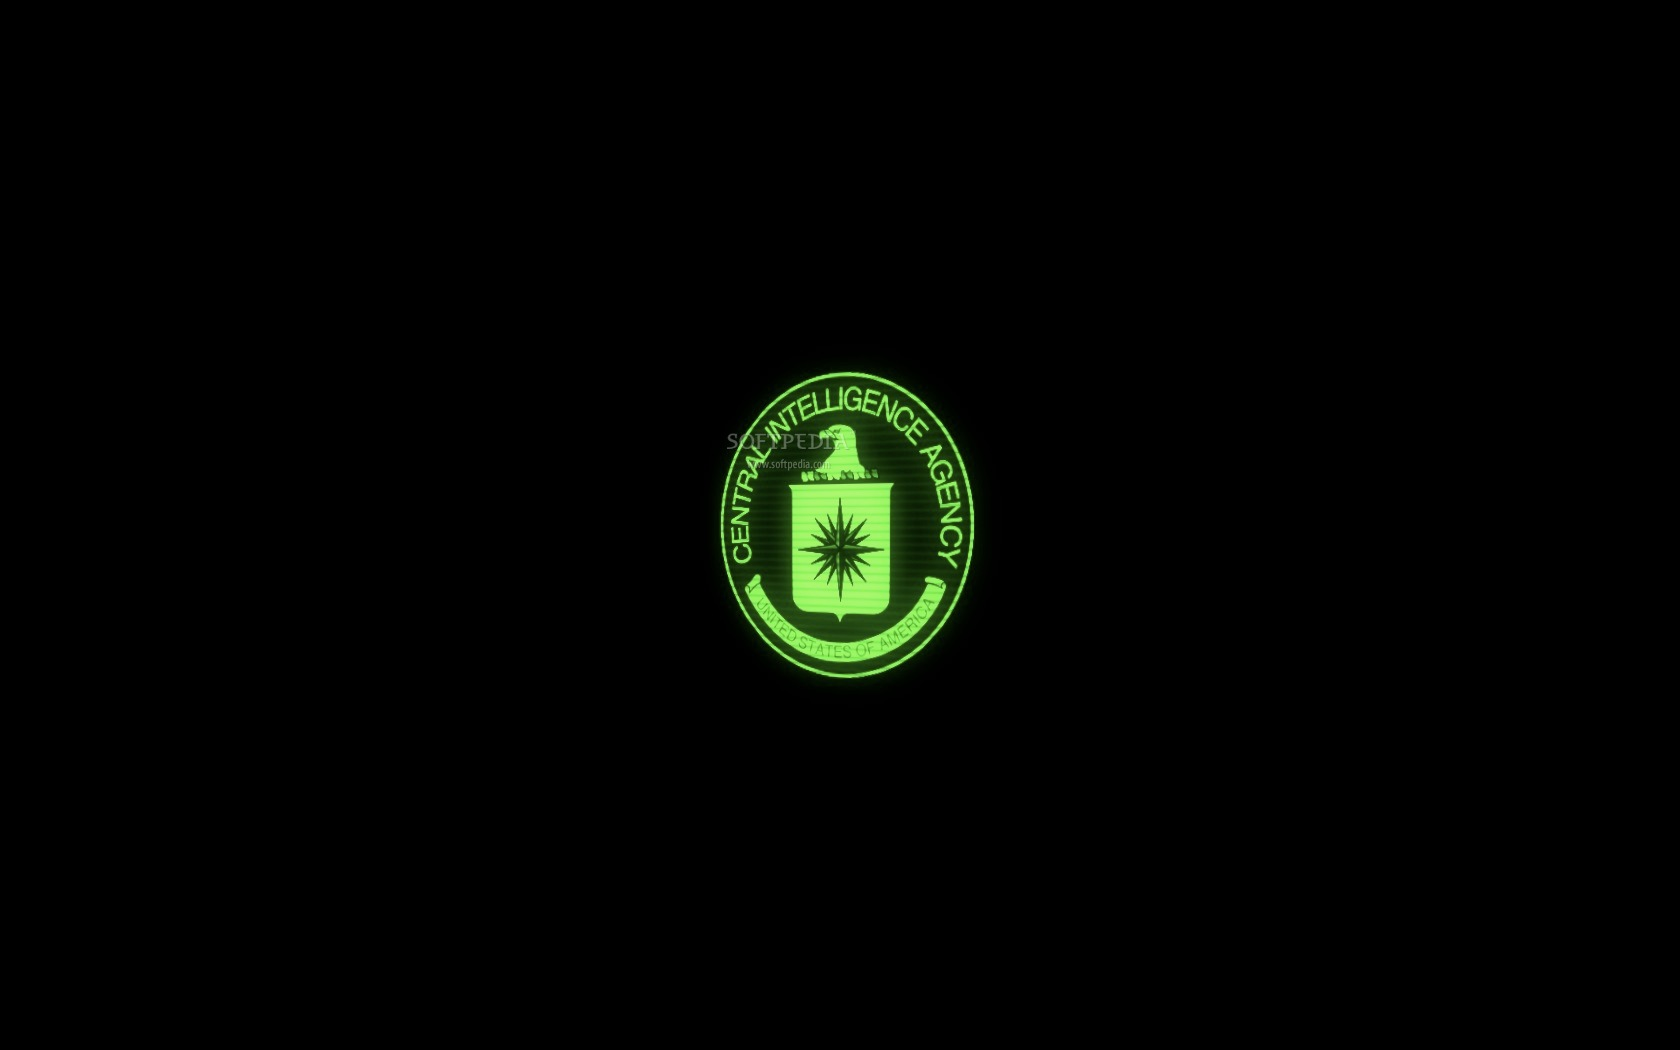 Download CIA Screensaver for Mac 1680x1050